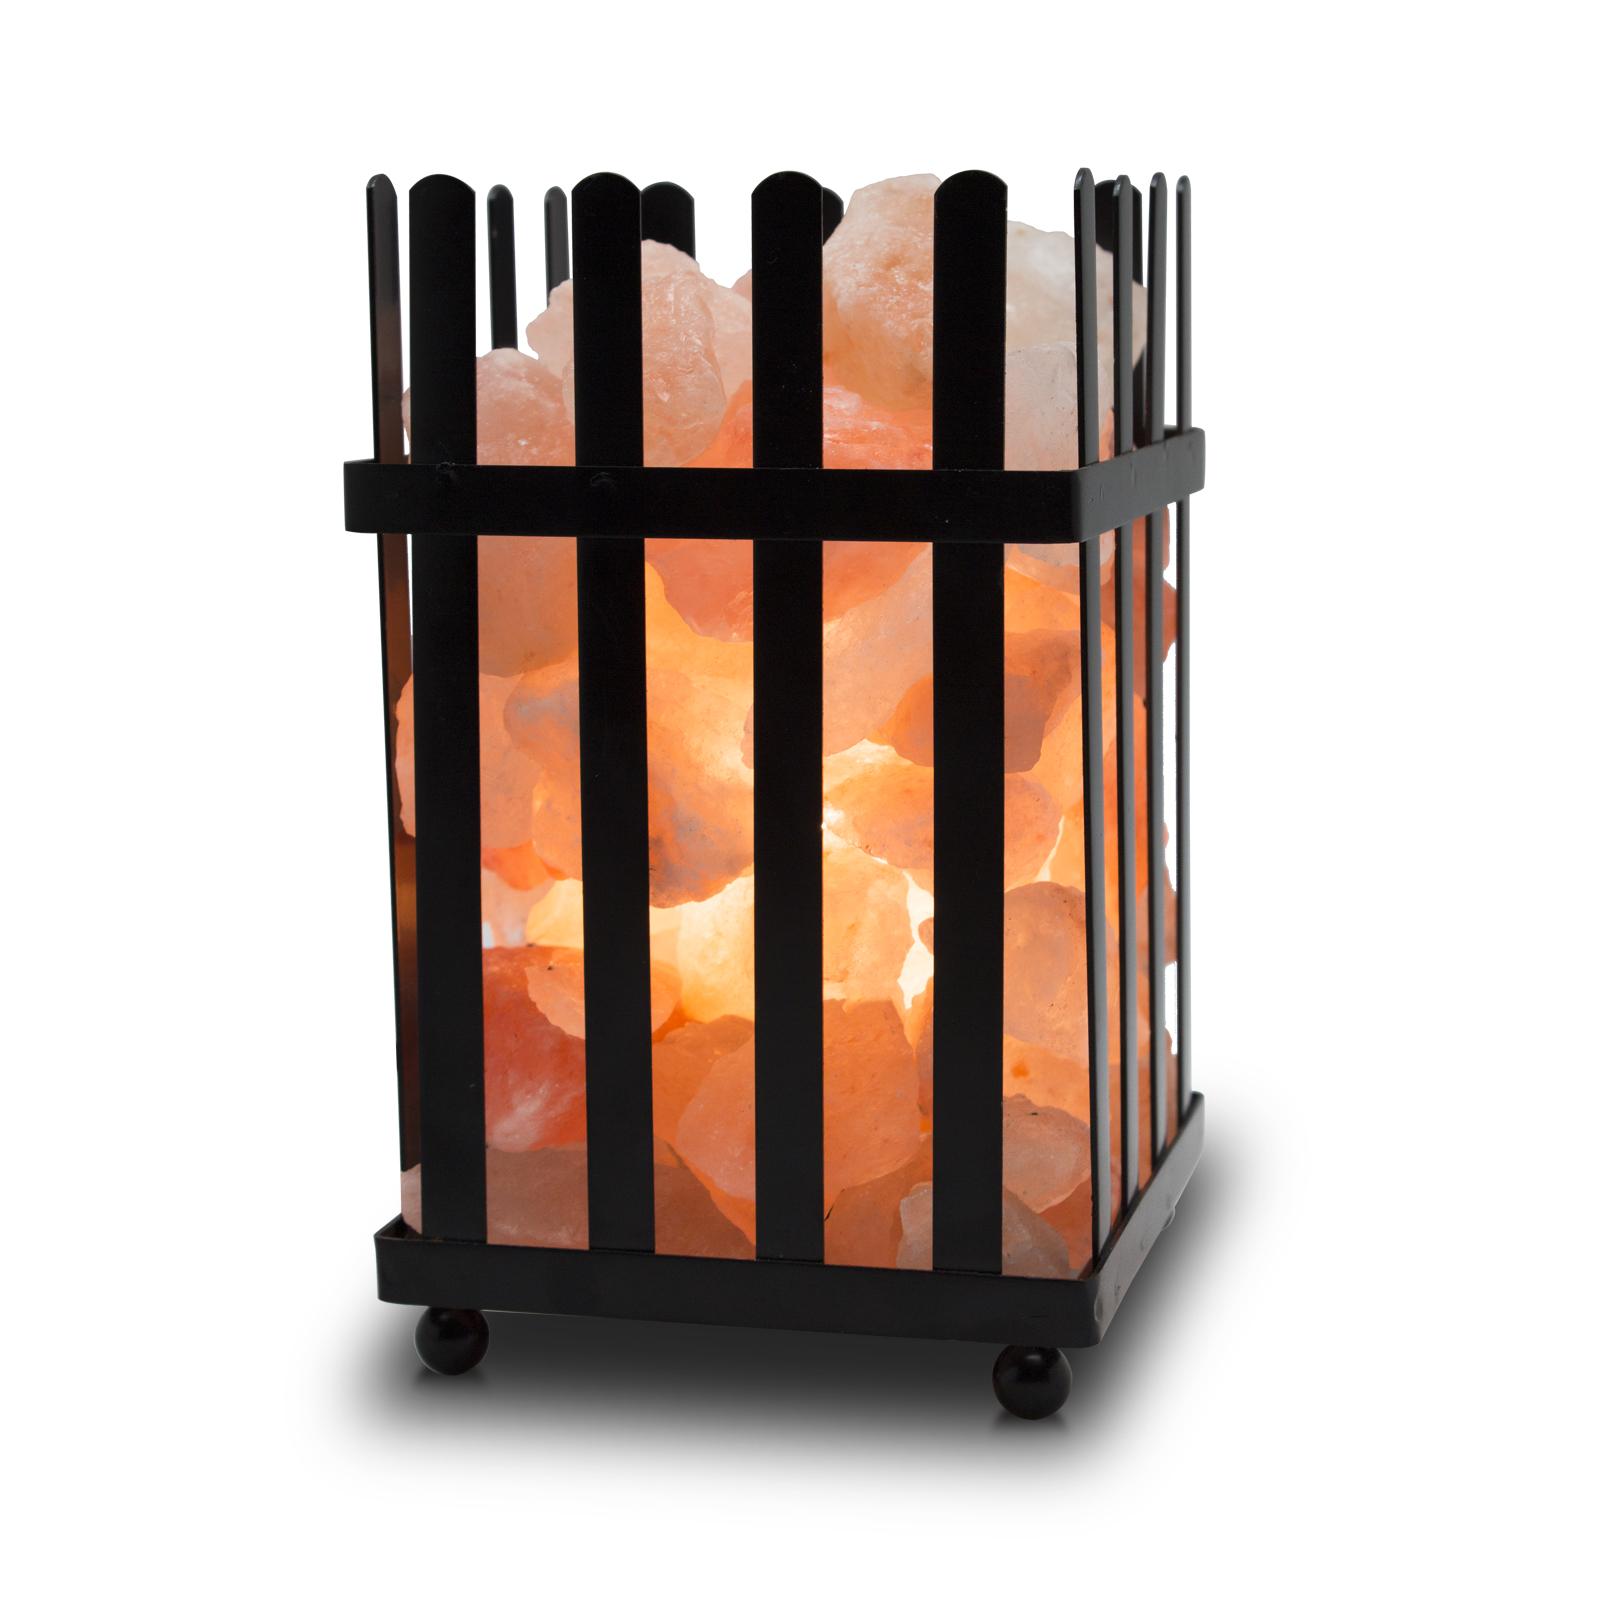 PRICE DROP Himalayan Glow Natural Salt Picket Fence Basket Lamp (5-7 lbs) - $4.47 Walmart, (free store pickup) and others